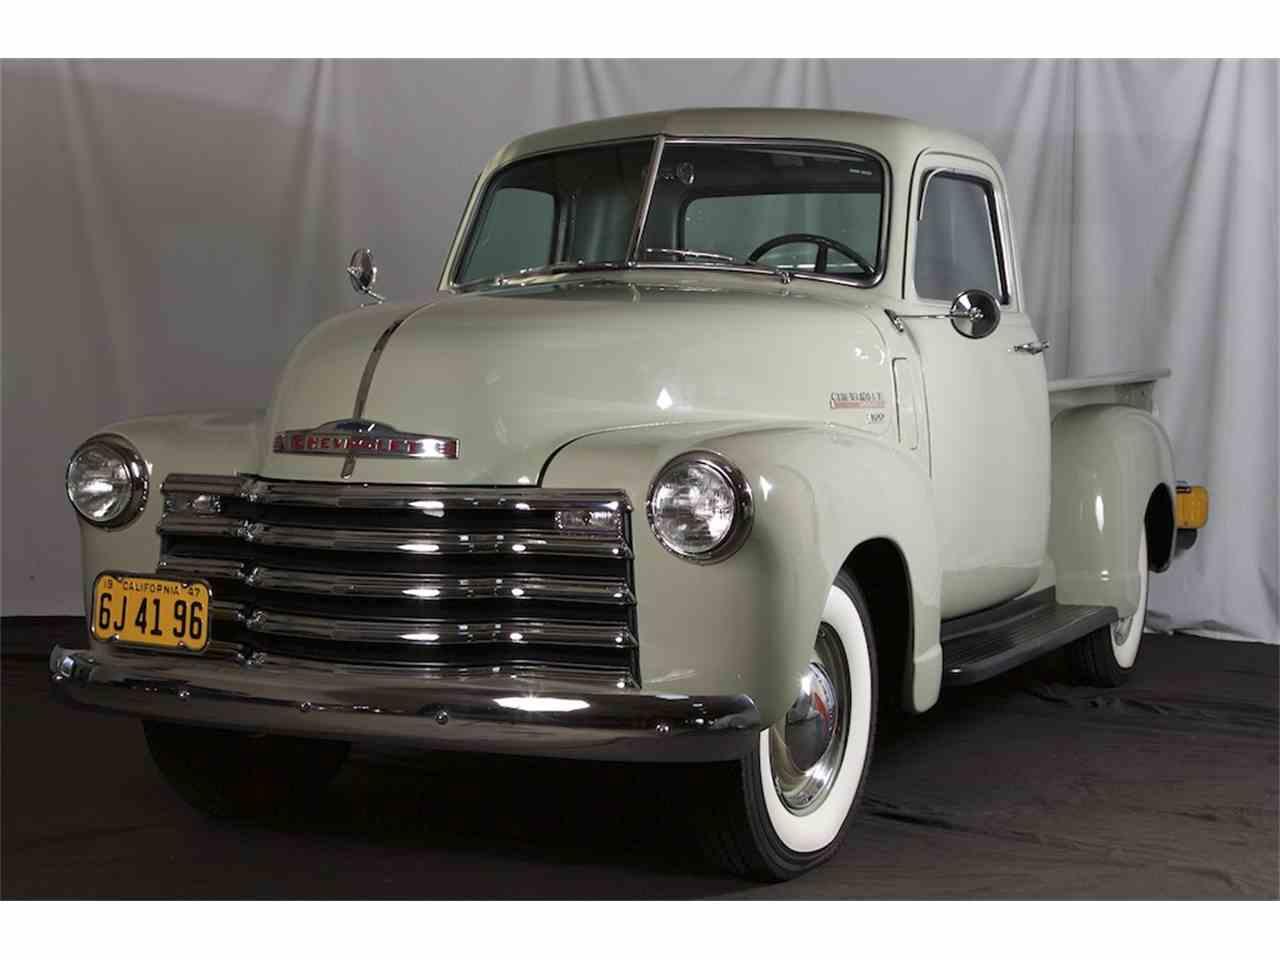 Pickup 1949 chevrolet pickup : 1949 Chevrolet Pickup for Sale   ClassicCars.com   CC-997346